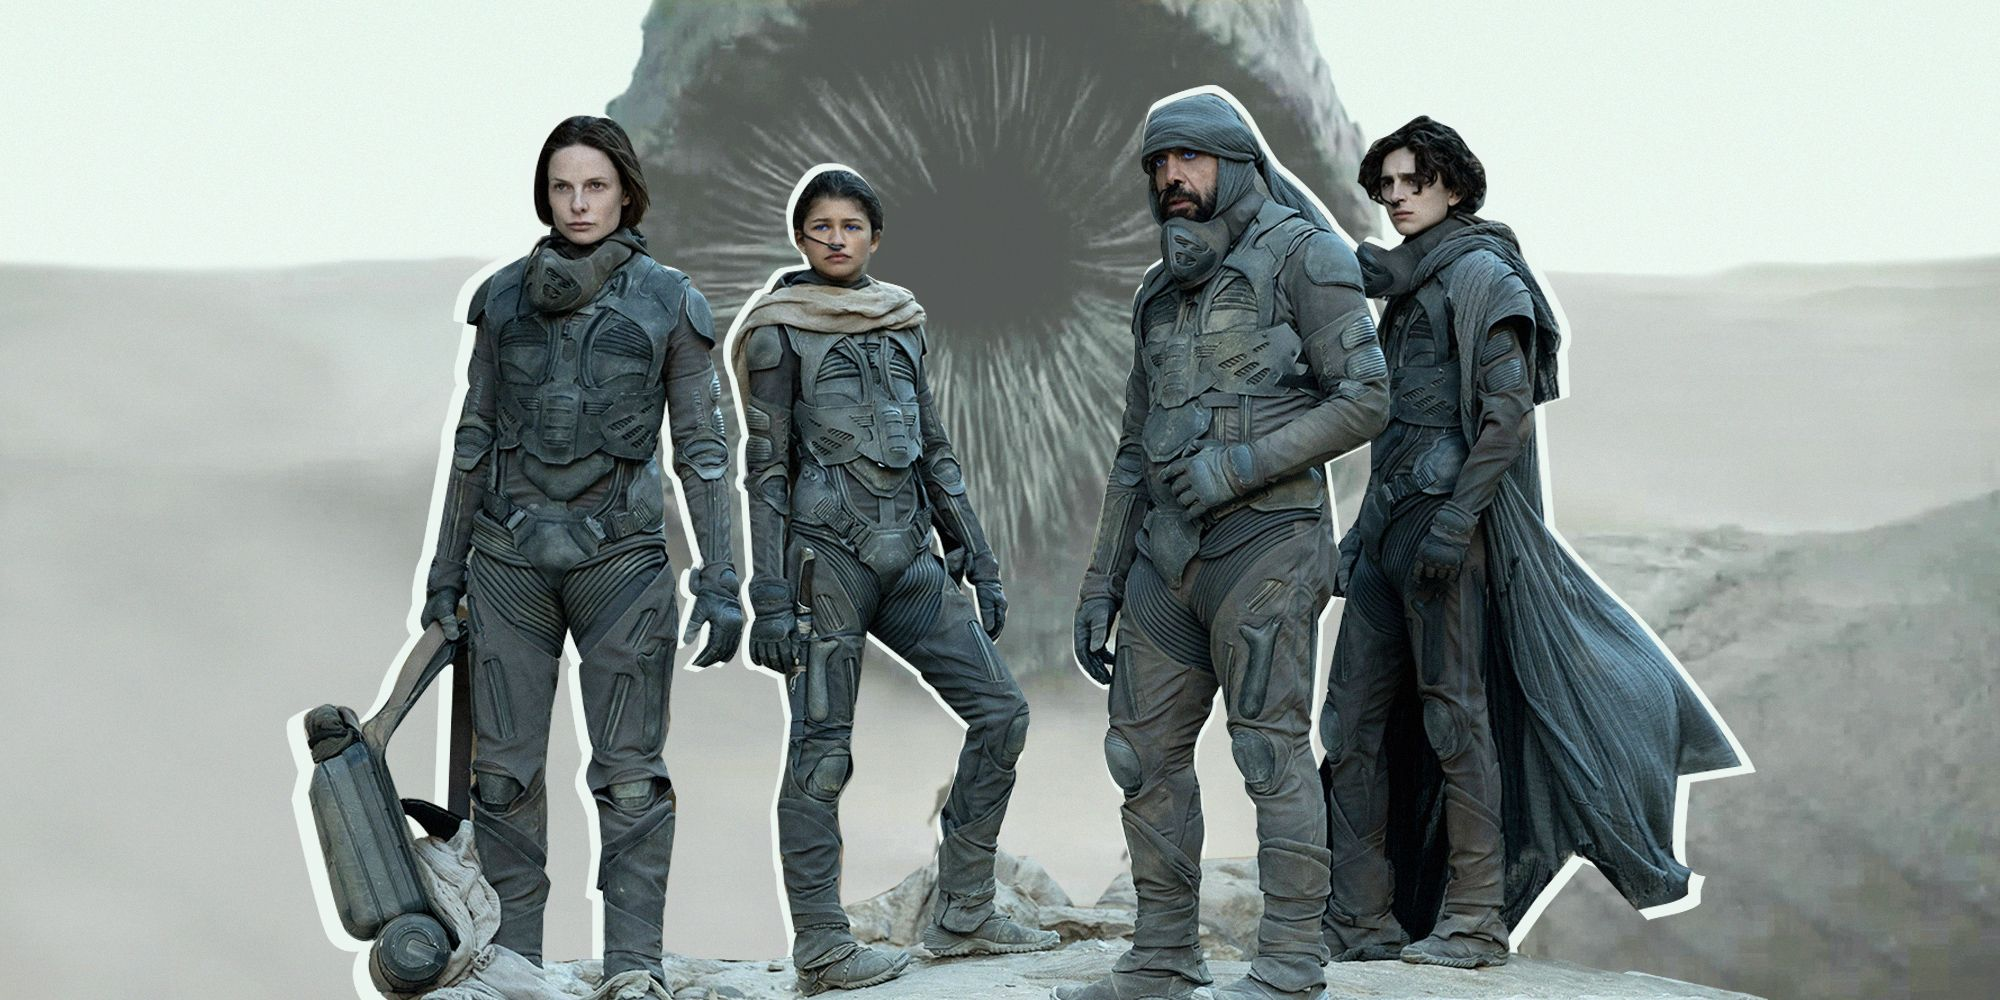 'It's Like the Unwinnable War': How the Team Behind Dune Finally Got it Right